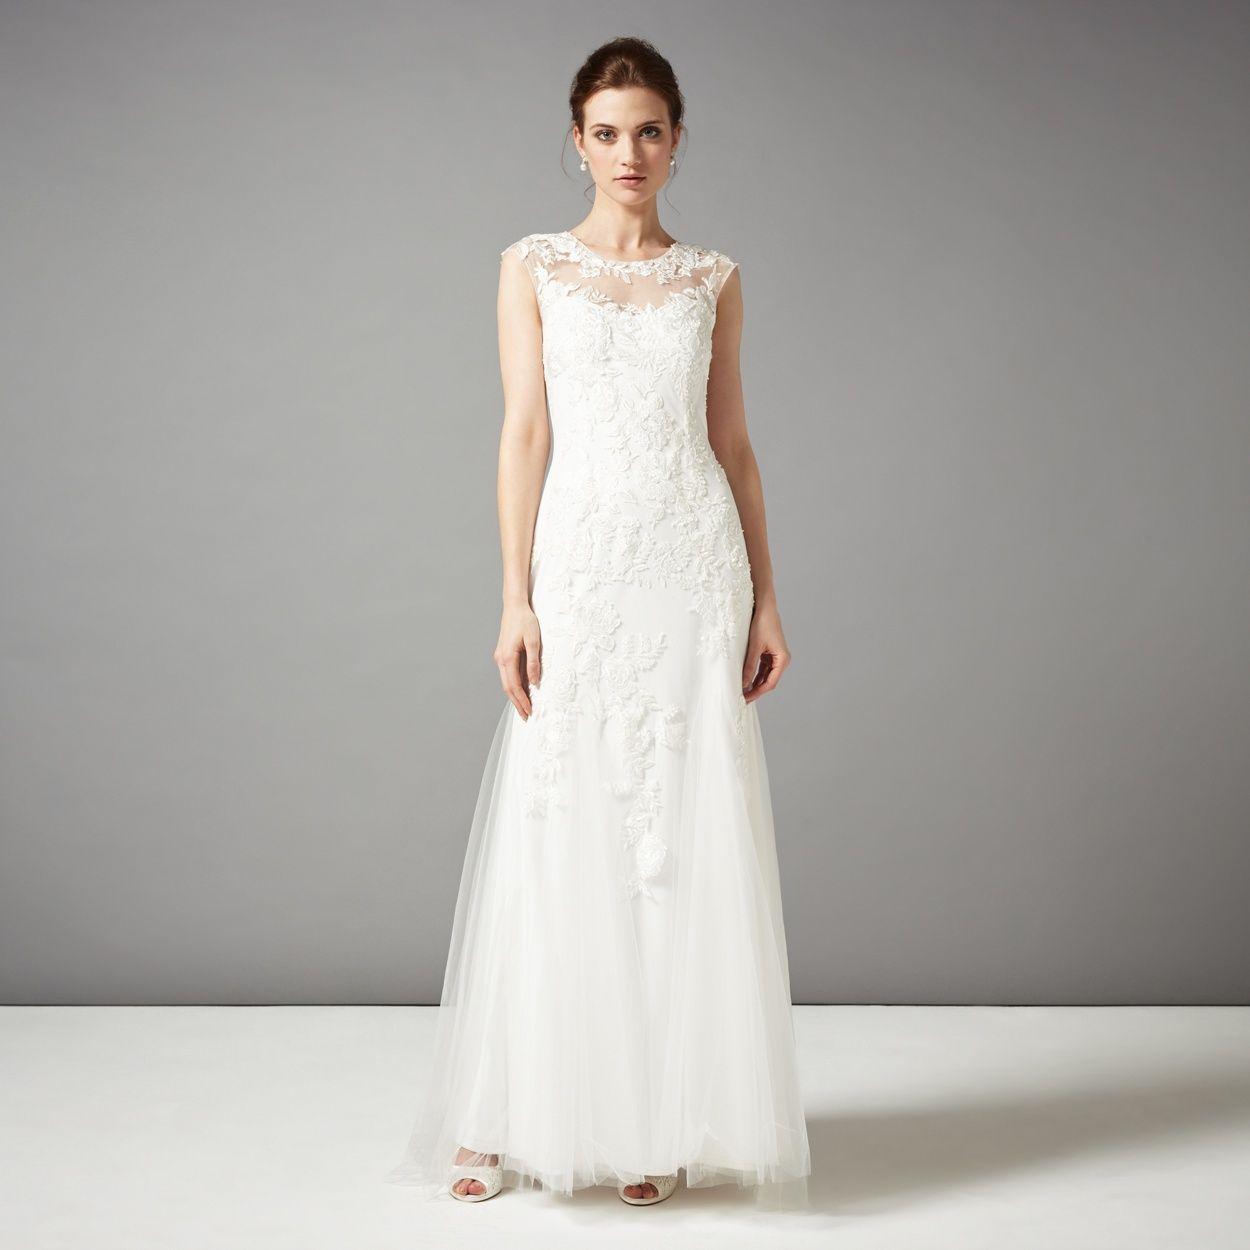 Phase Eight Ivory josefina wedding dress- at Debenhams.com | Wedding ...